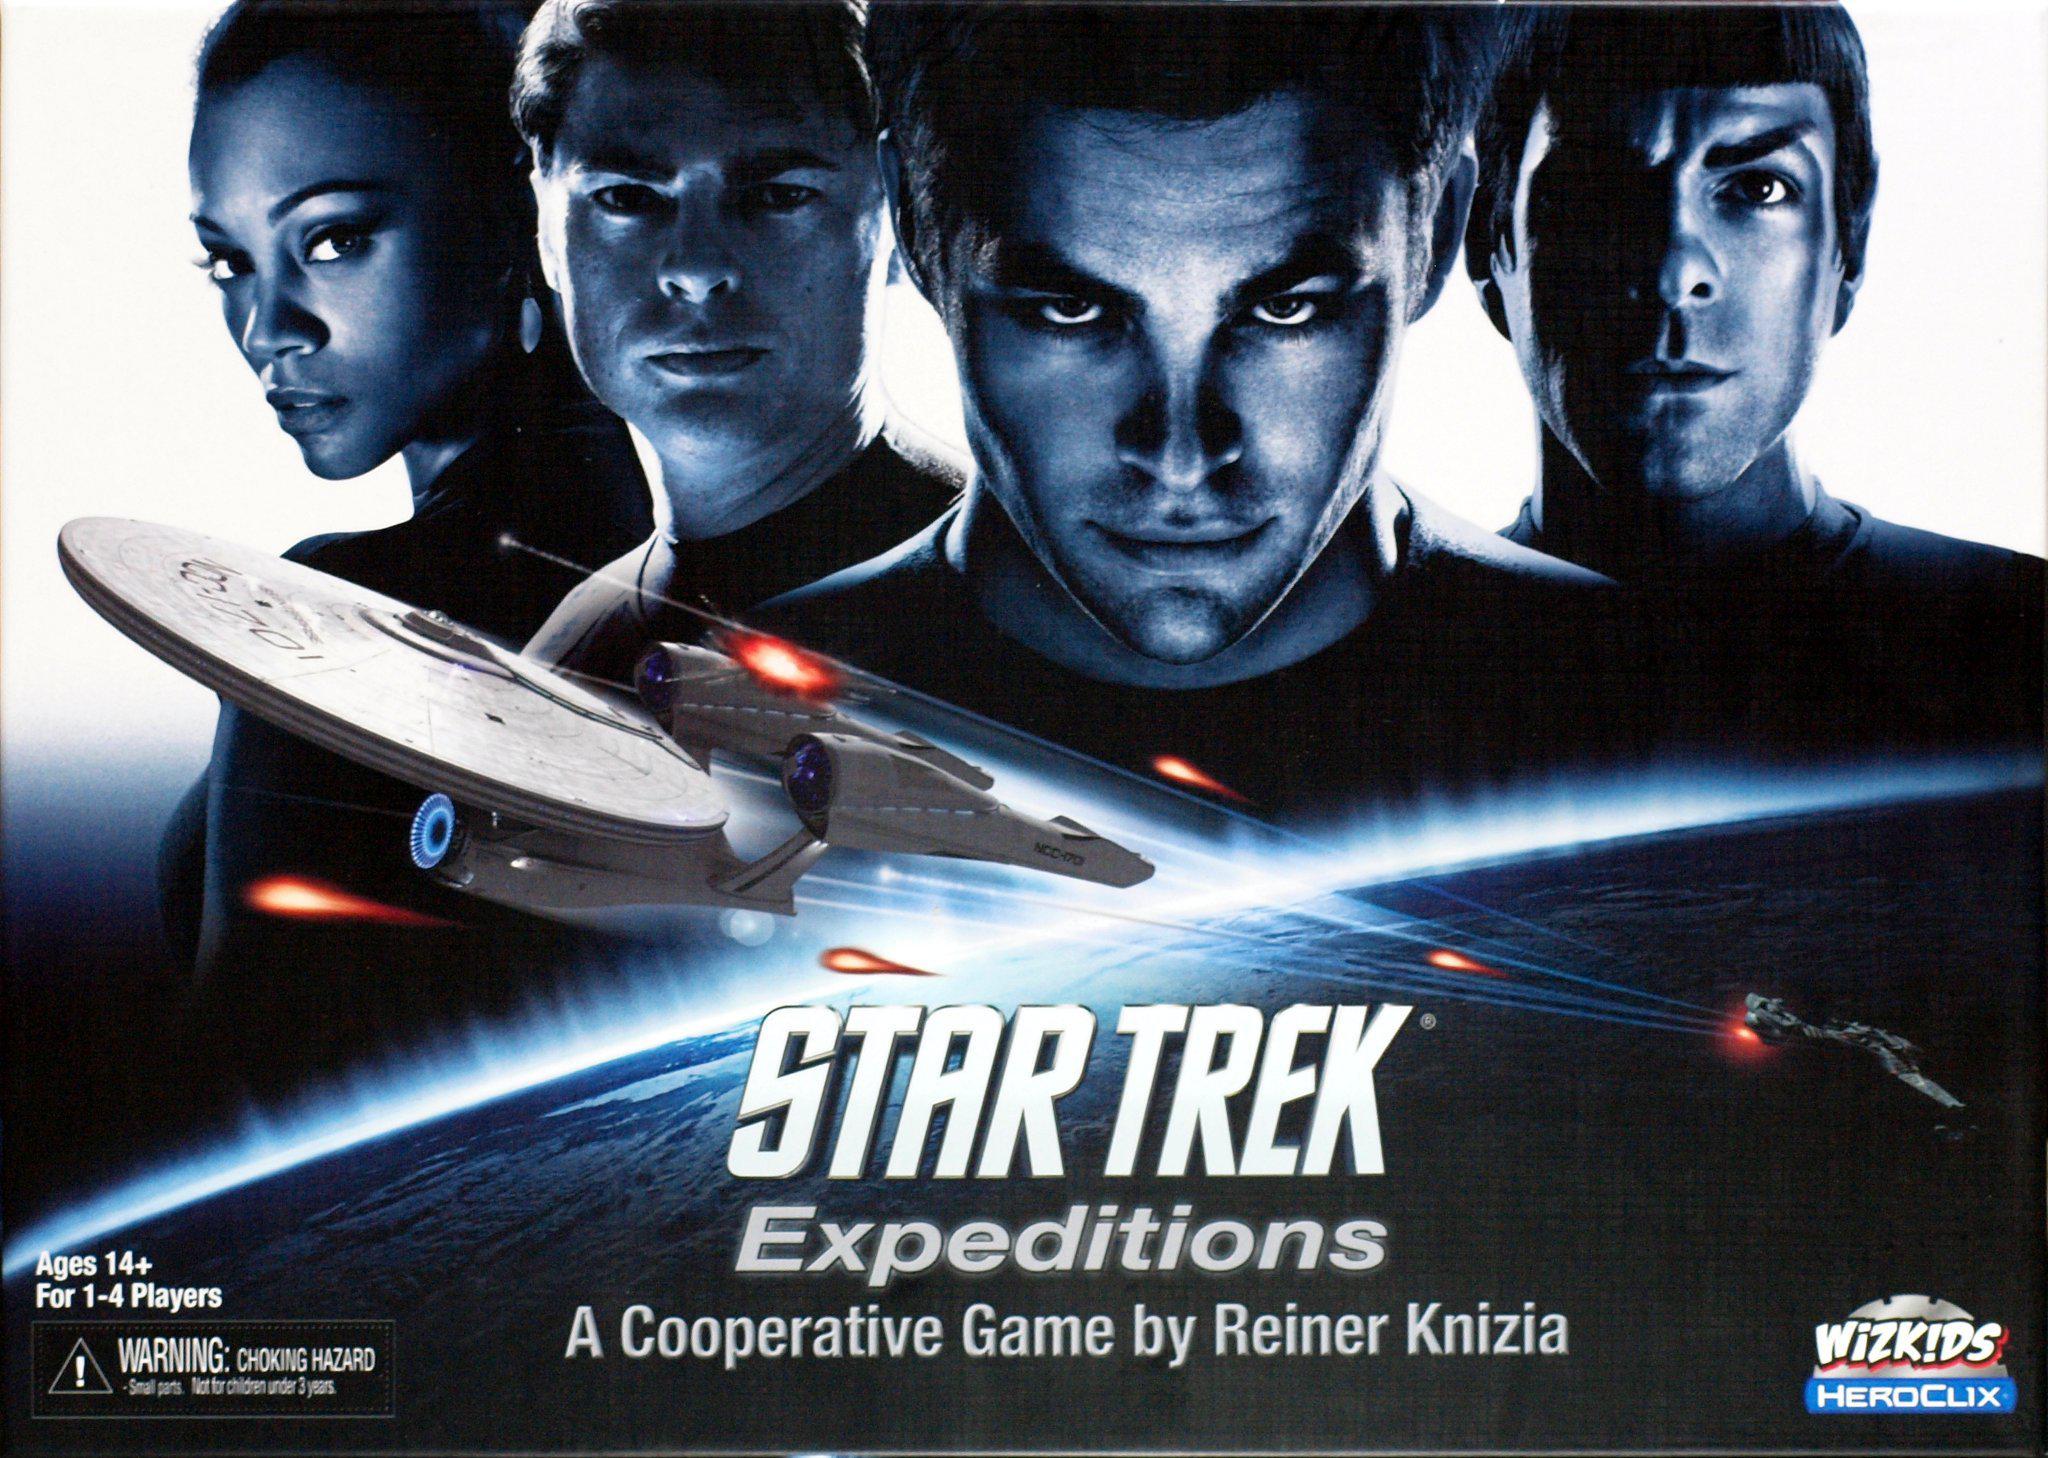 Star Trek: Expeditions imagine